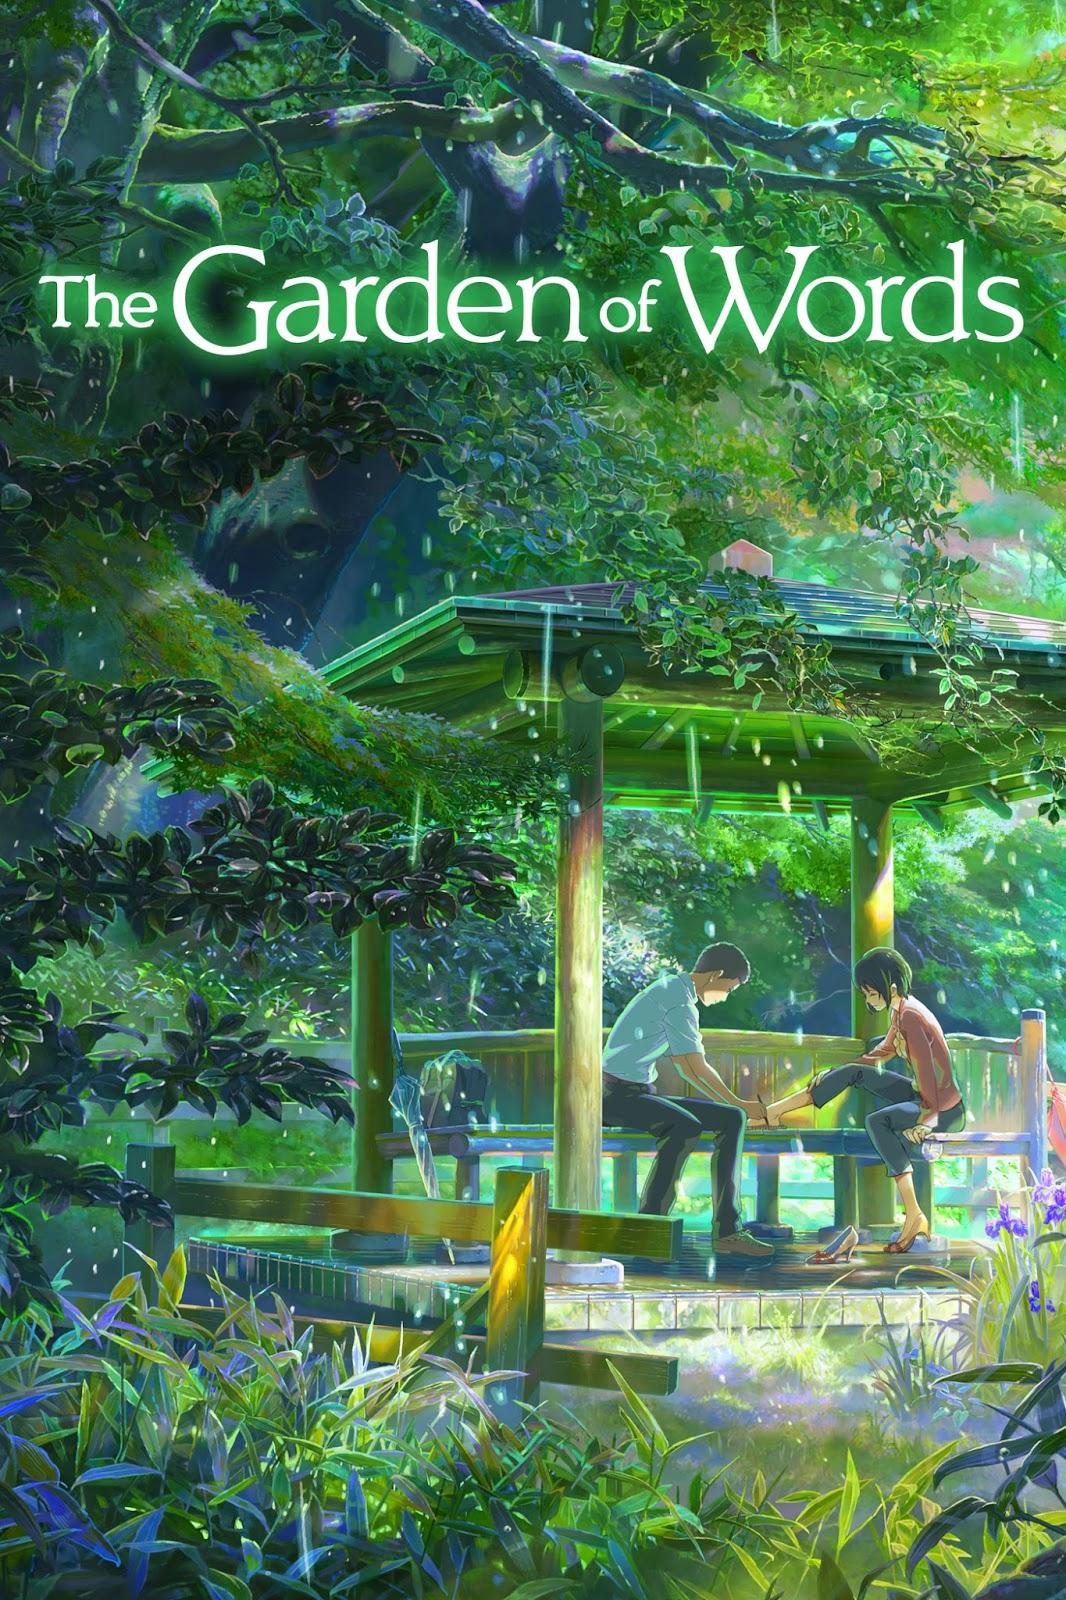 The Garden of Words ยามสายฝนโปรยปราย [HD][พากย์ไทย]